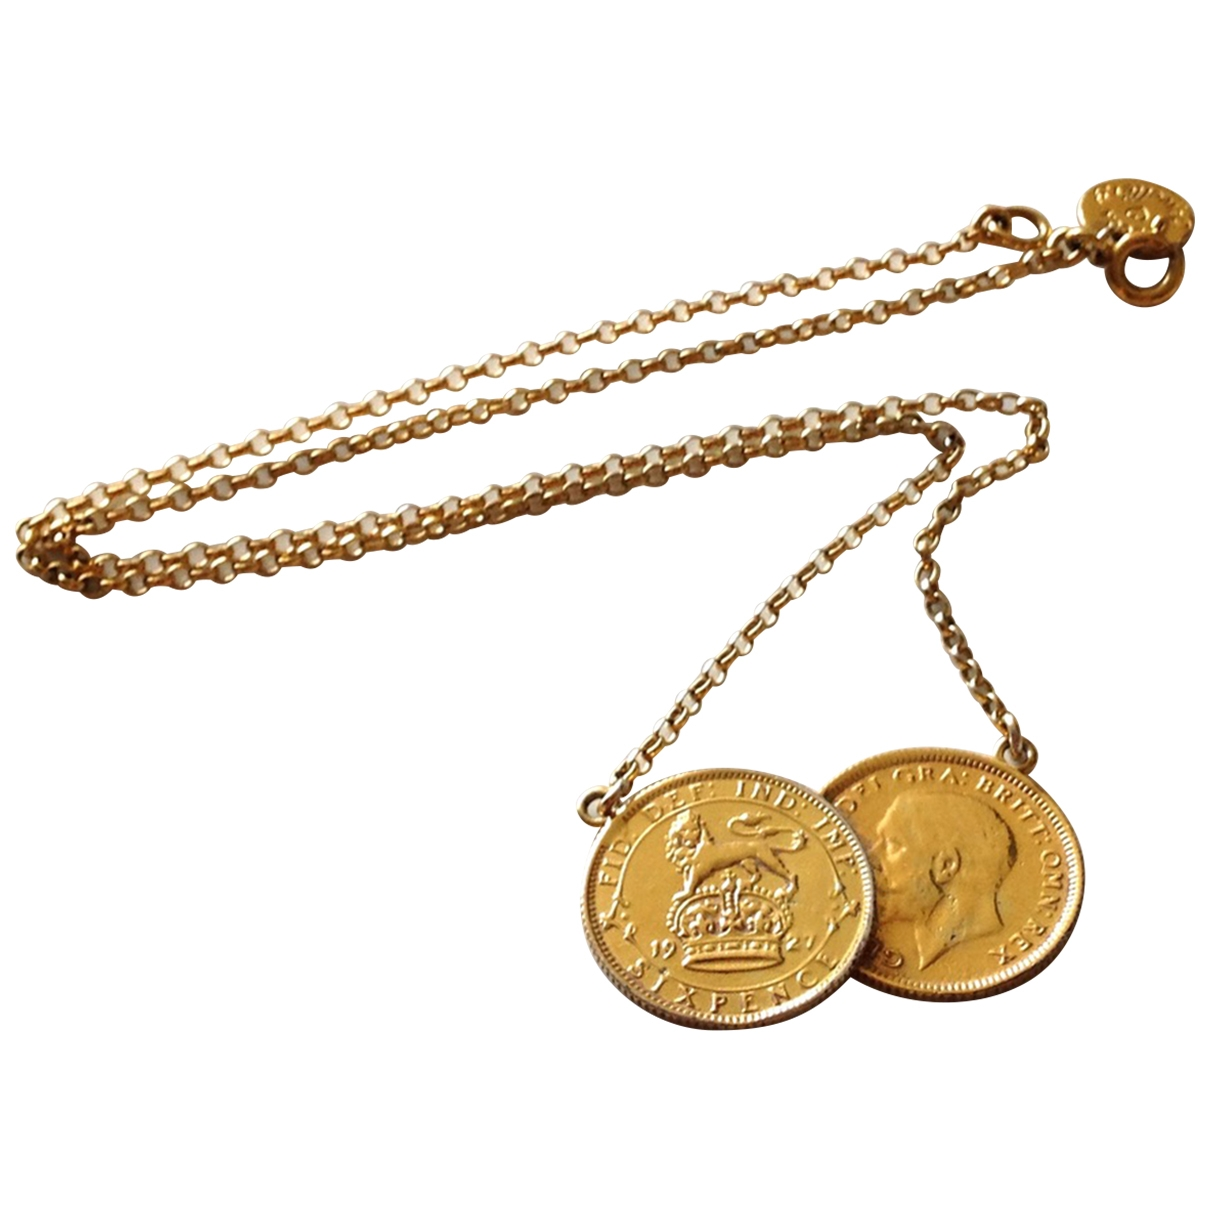 Becca Jewellery \N Kette in  Gold Silber